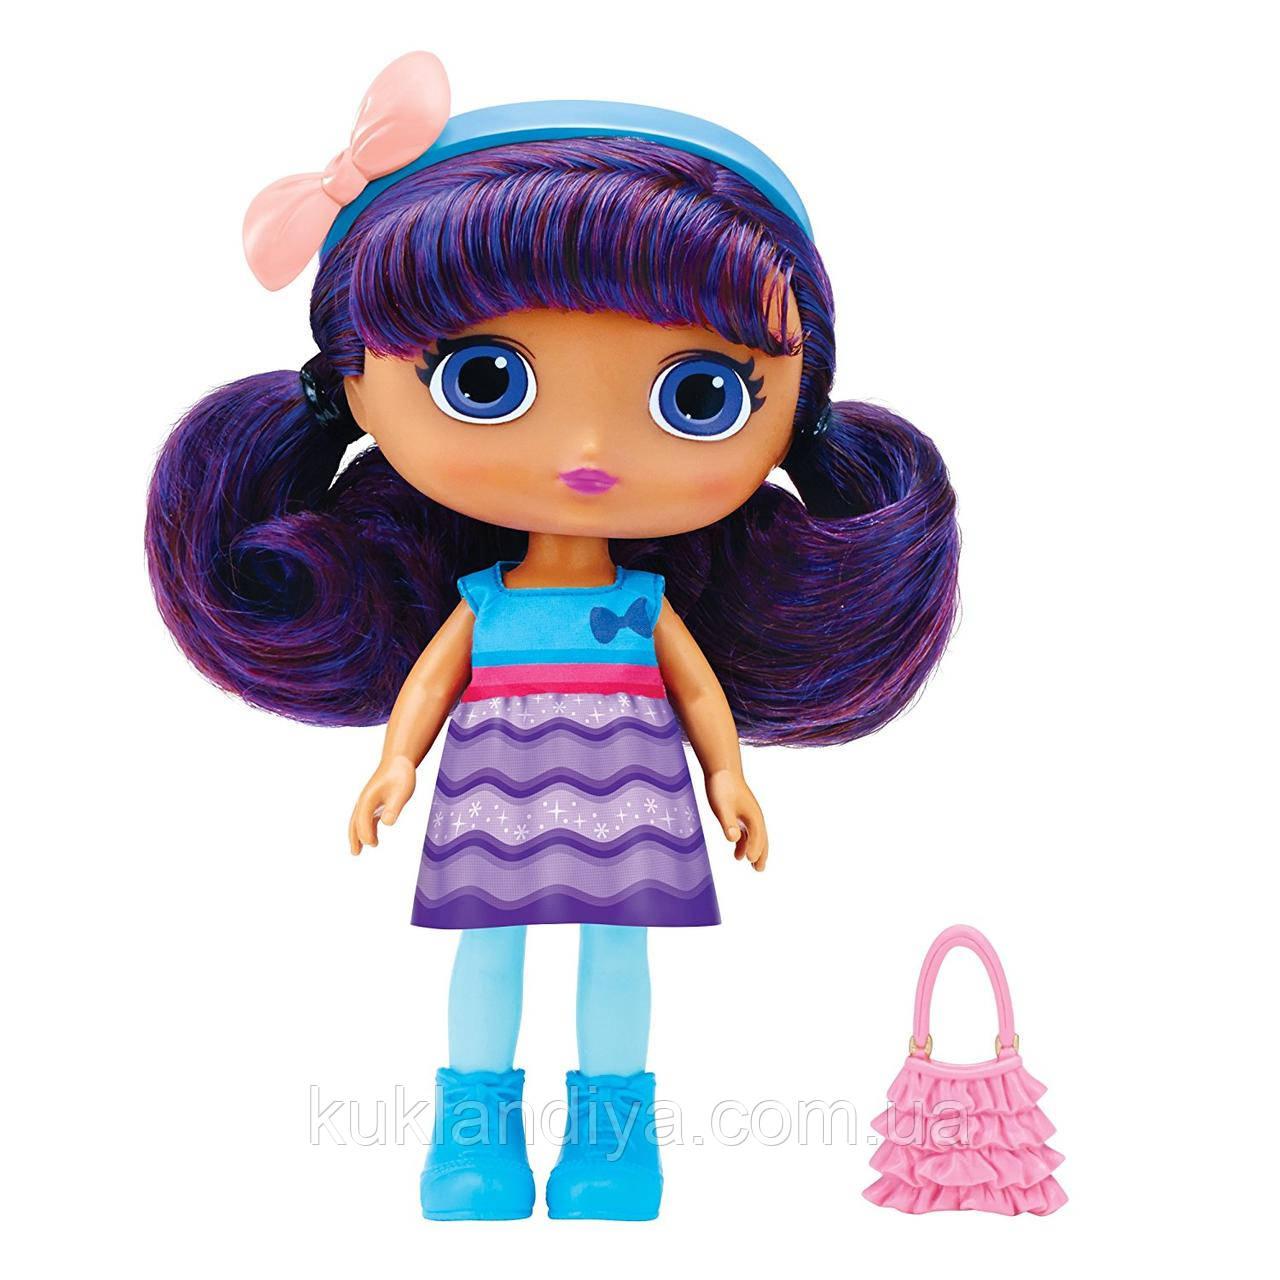 Лялька Лавендер Little Charmers Lavender 18 см